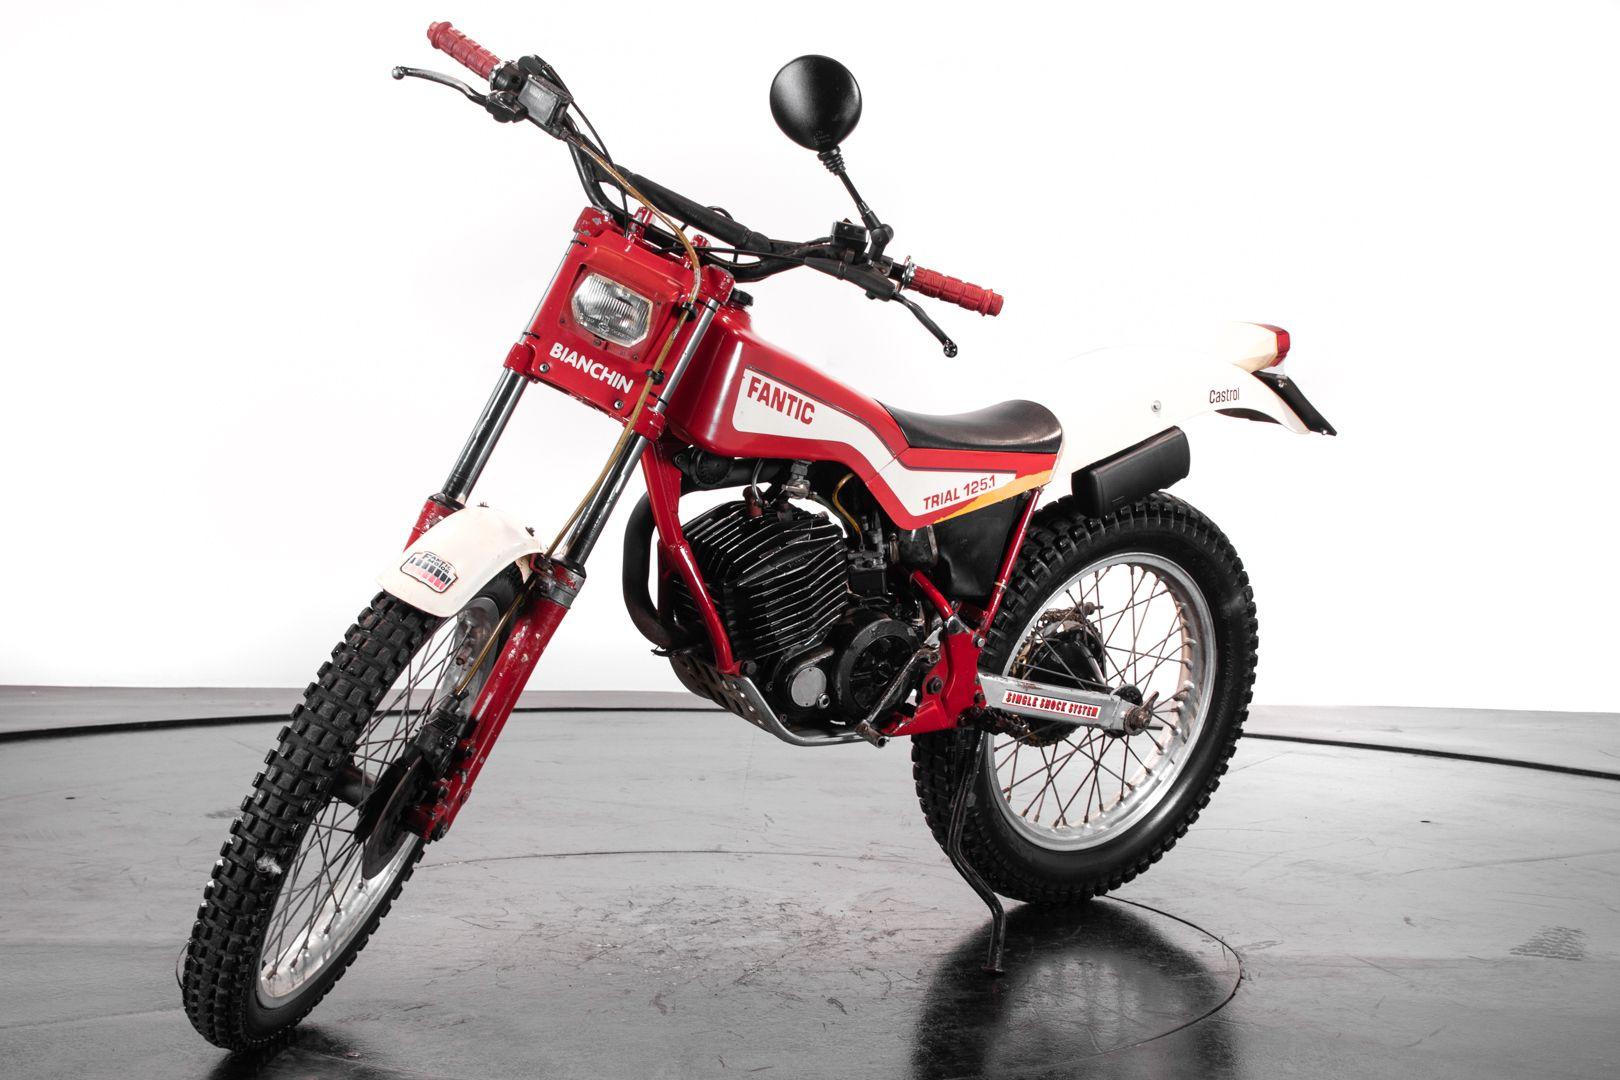 1986 Fantic Motor Trial 125 Professional 237 69033